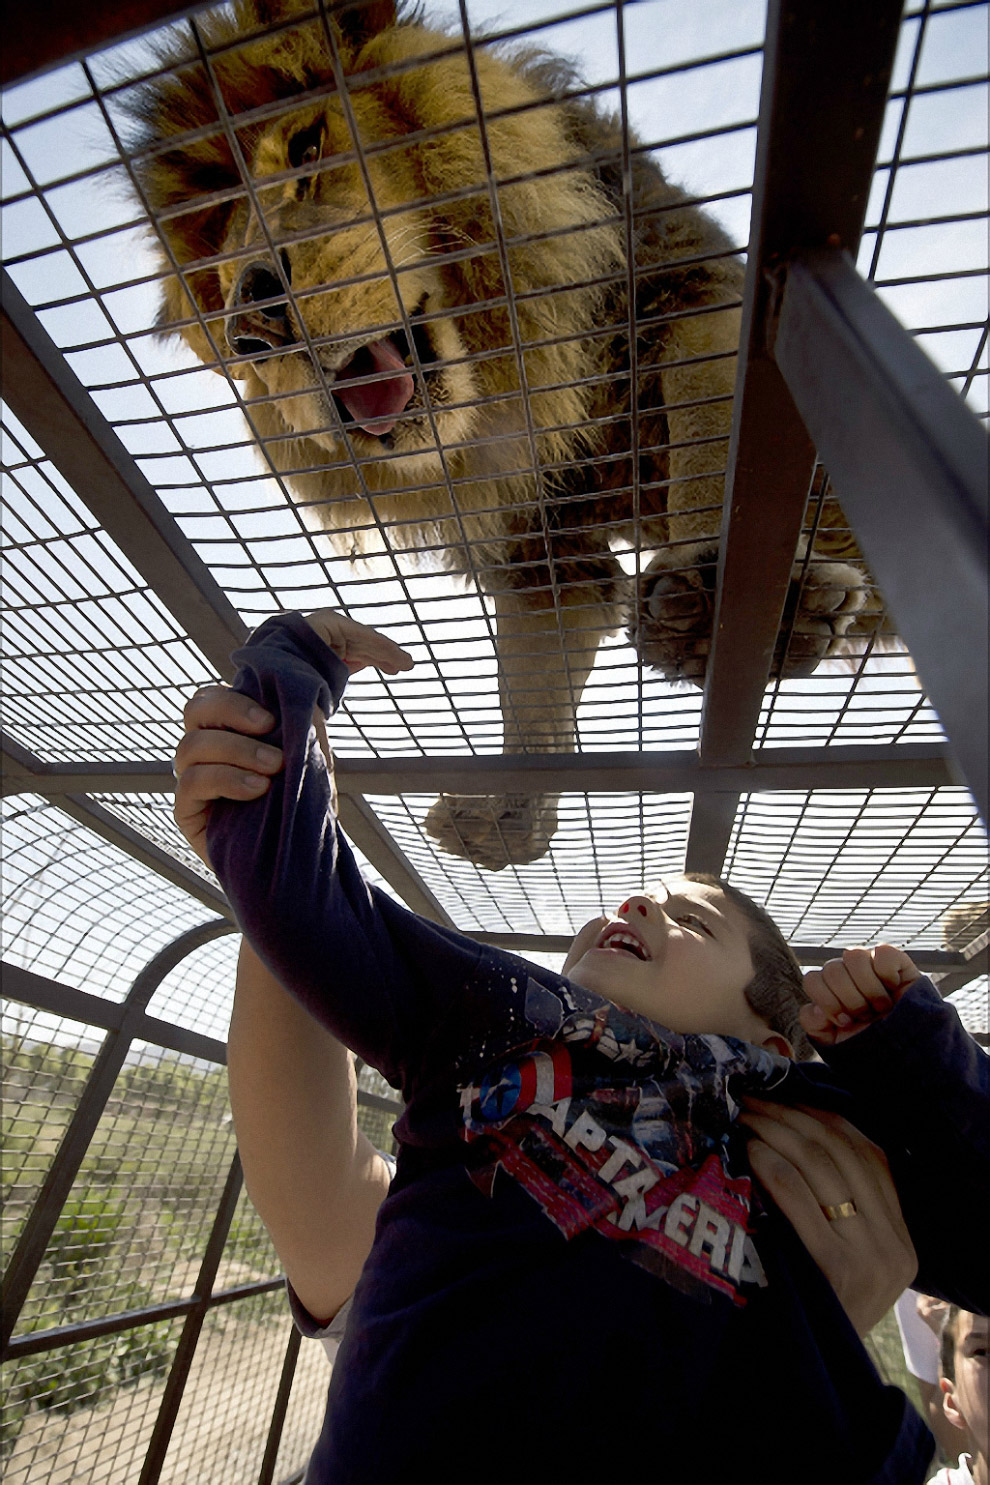 Сафари-парк в Ранкагуа, Чили, где хищники ходят там, где хотят, а люби приезжают к ним в клетках